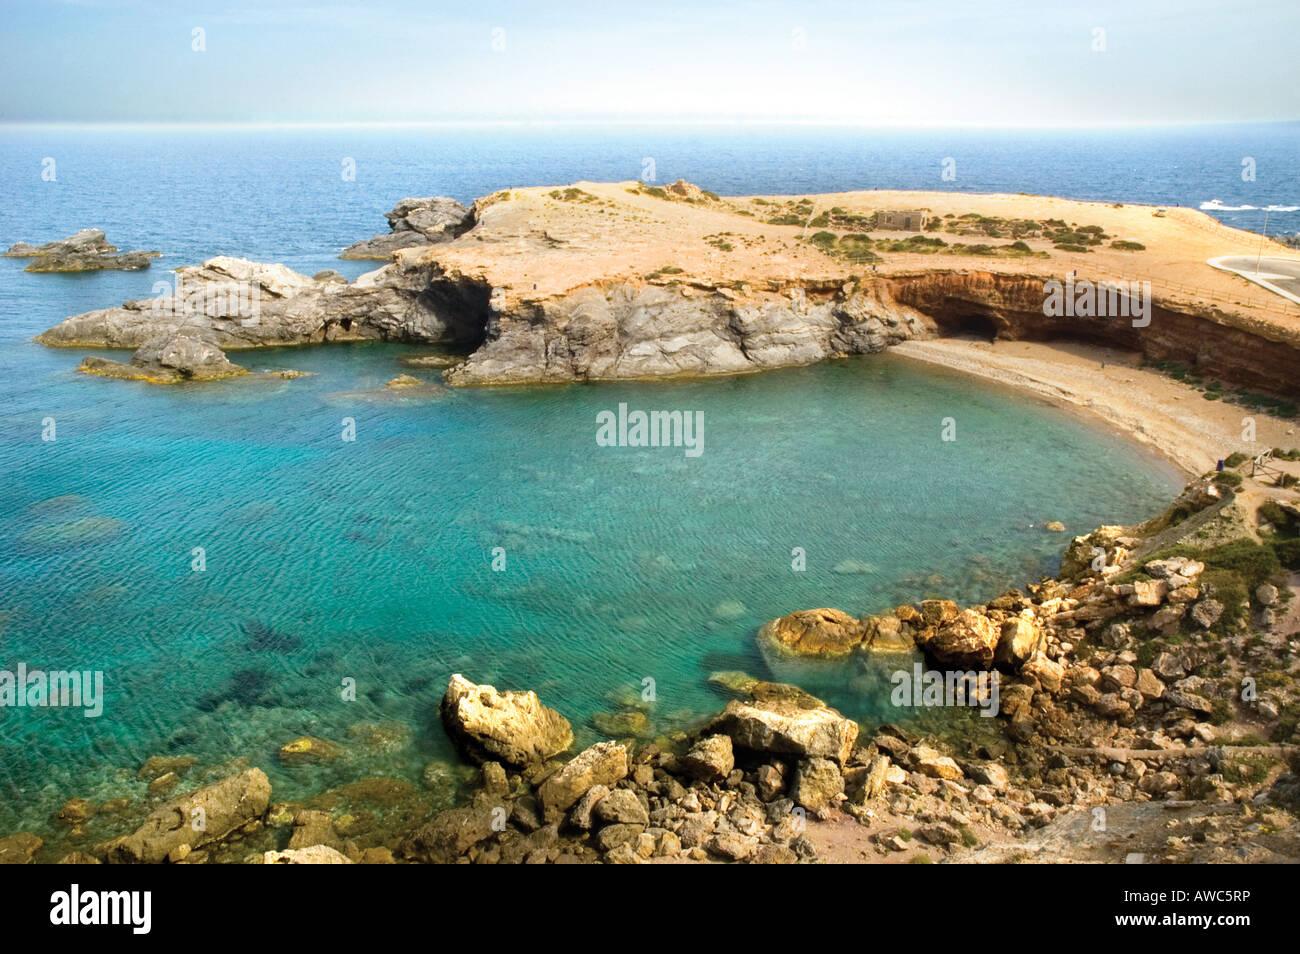 Cabo De Palos, Costa Calida, Spain Stock Photo, Royalty Free Image: 16534953 - Alamy